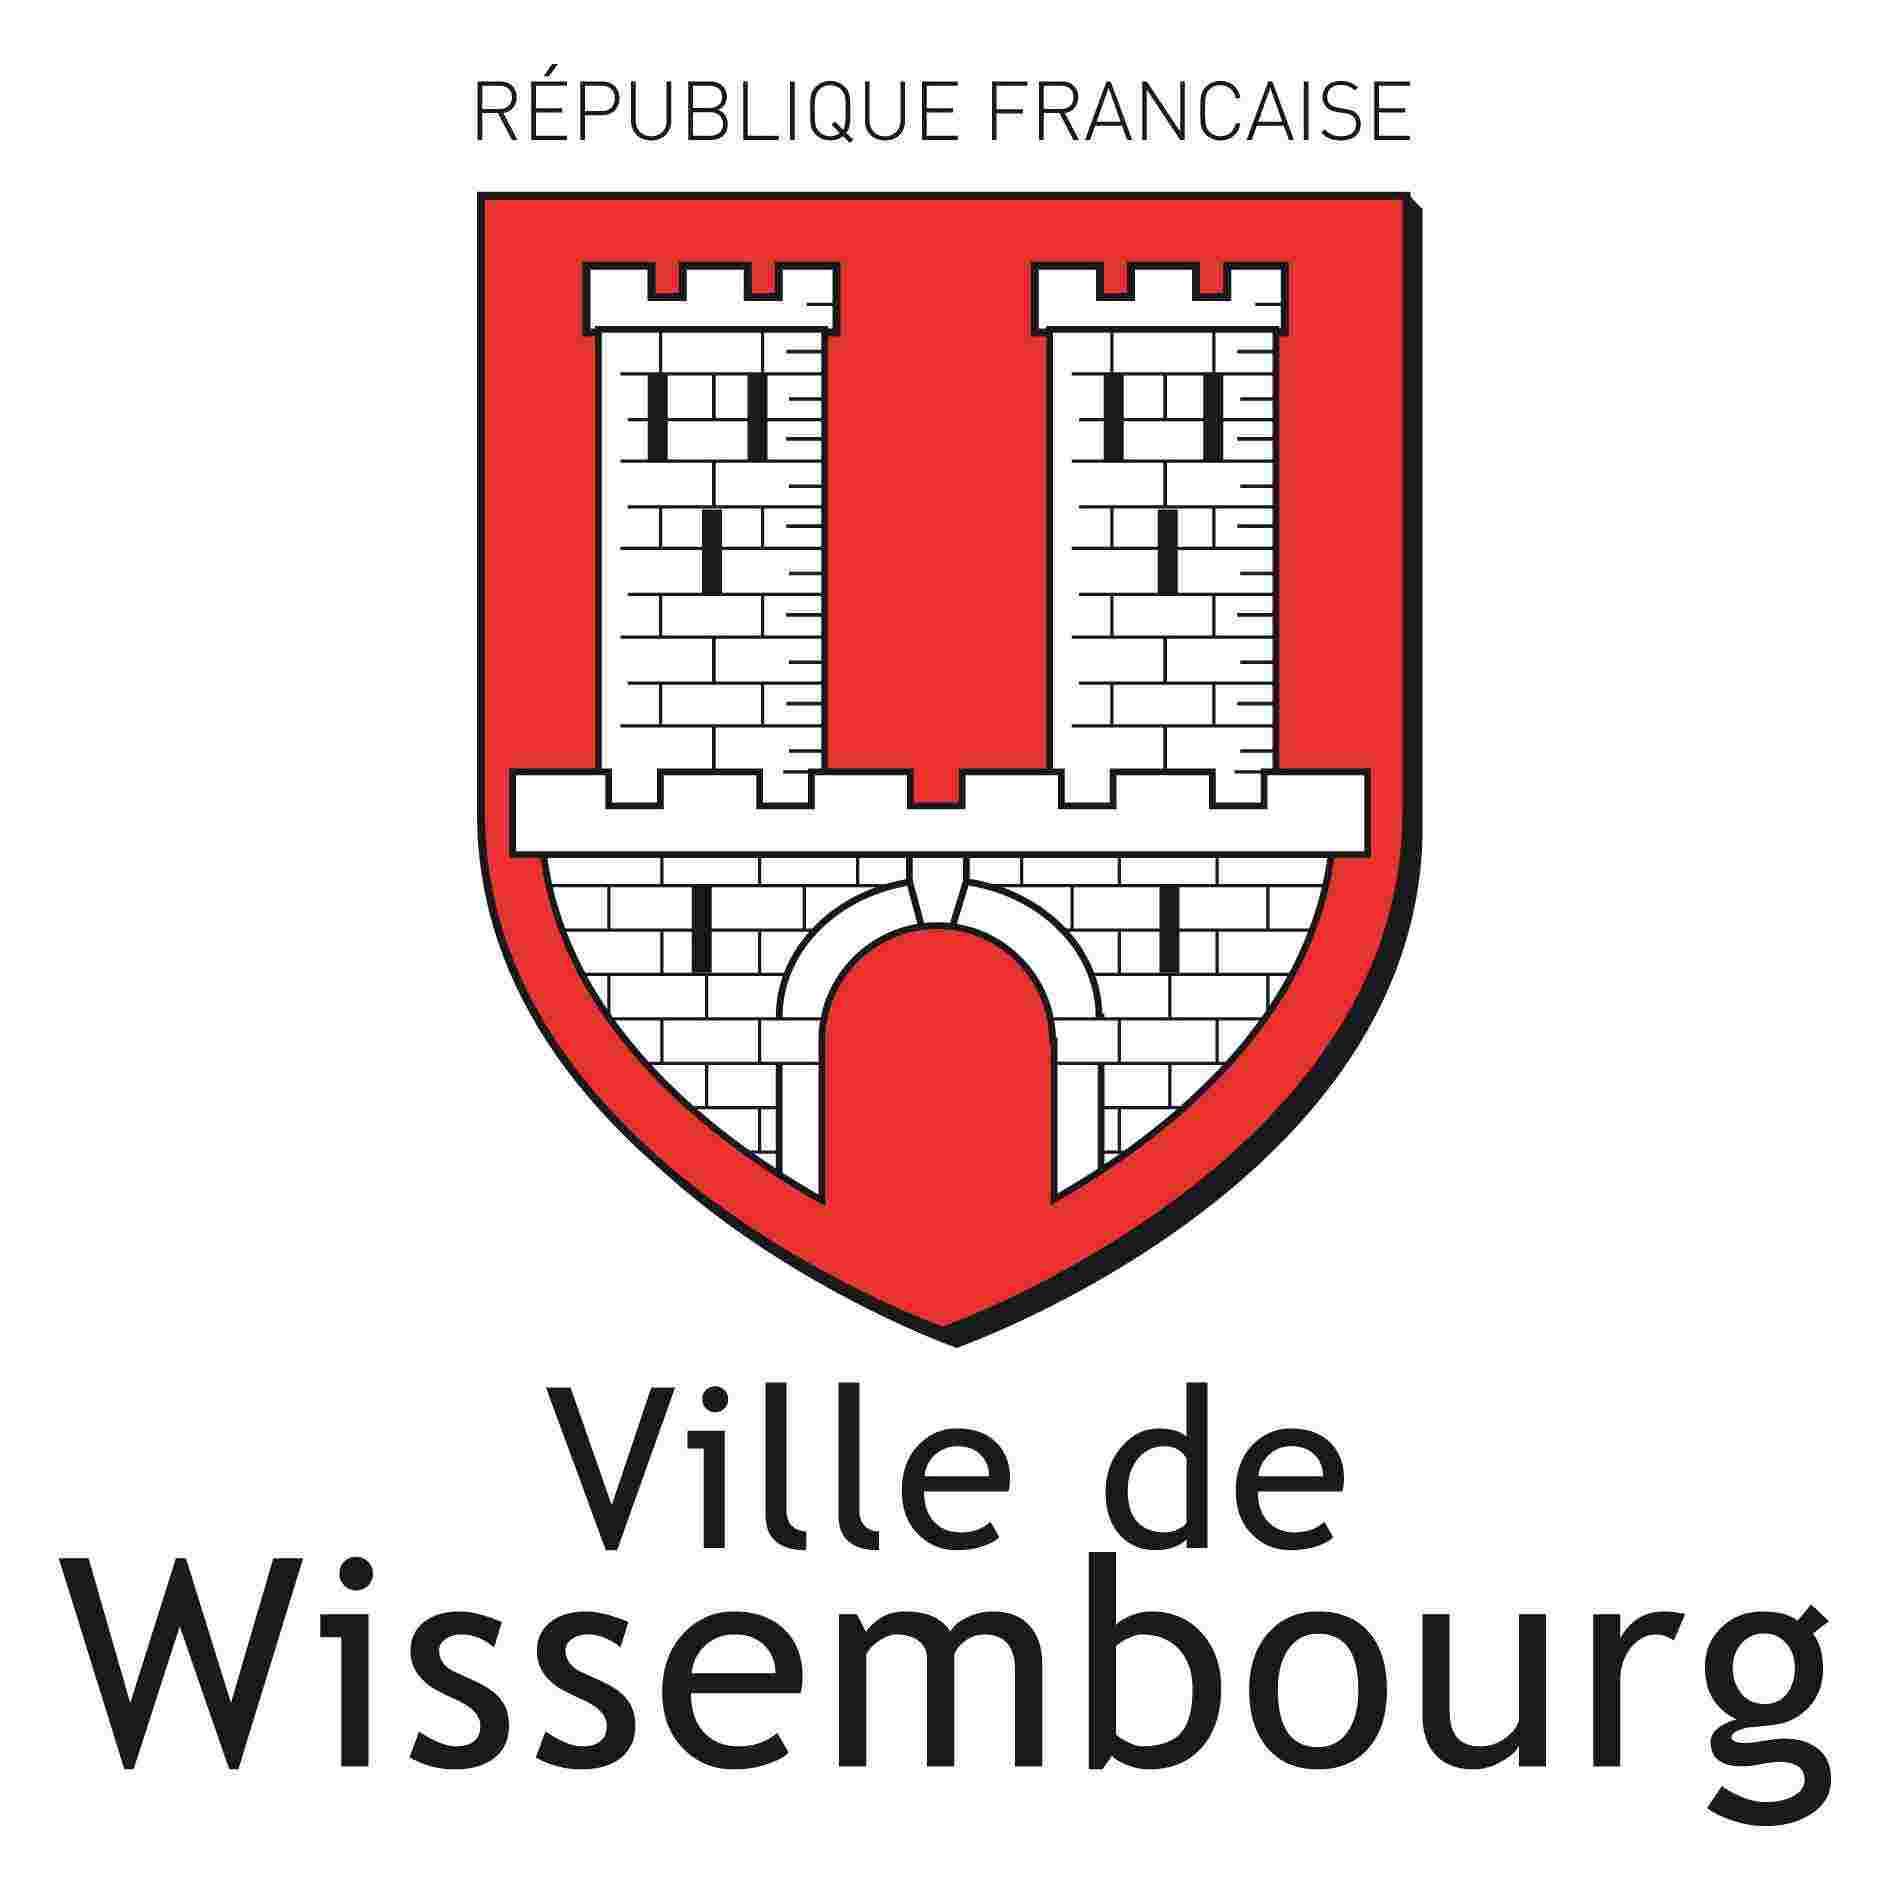 VILLE DE WISSEMBOURG